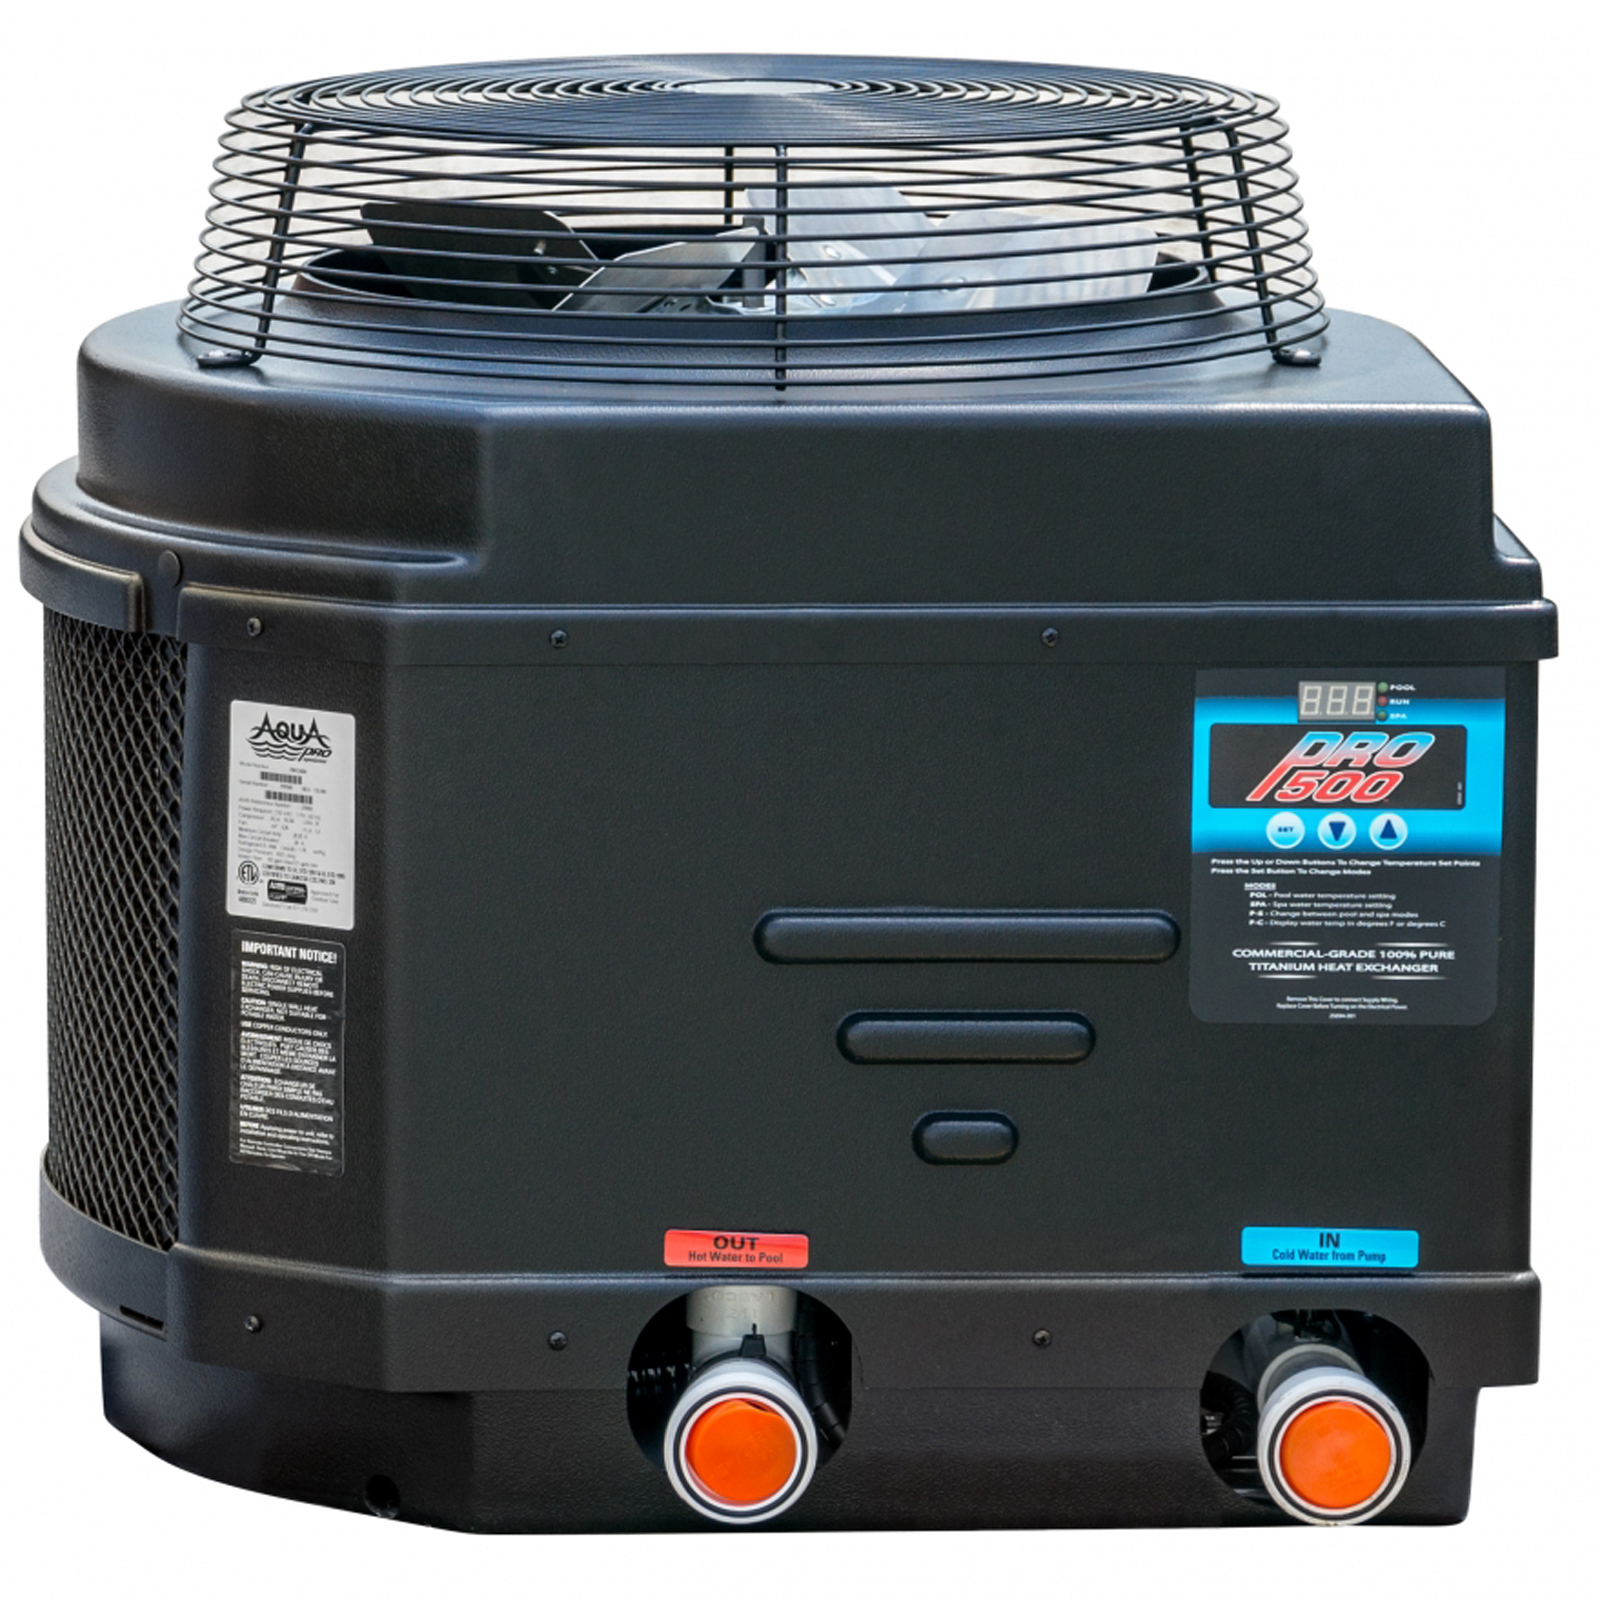 Aquapro Pro500 50 000 Btu Above Ground Swimming Pool Heat